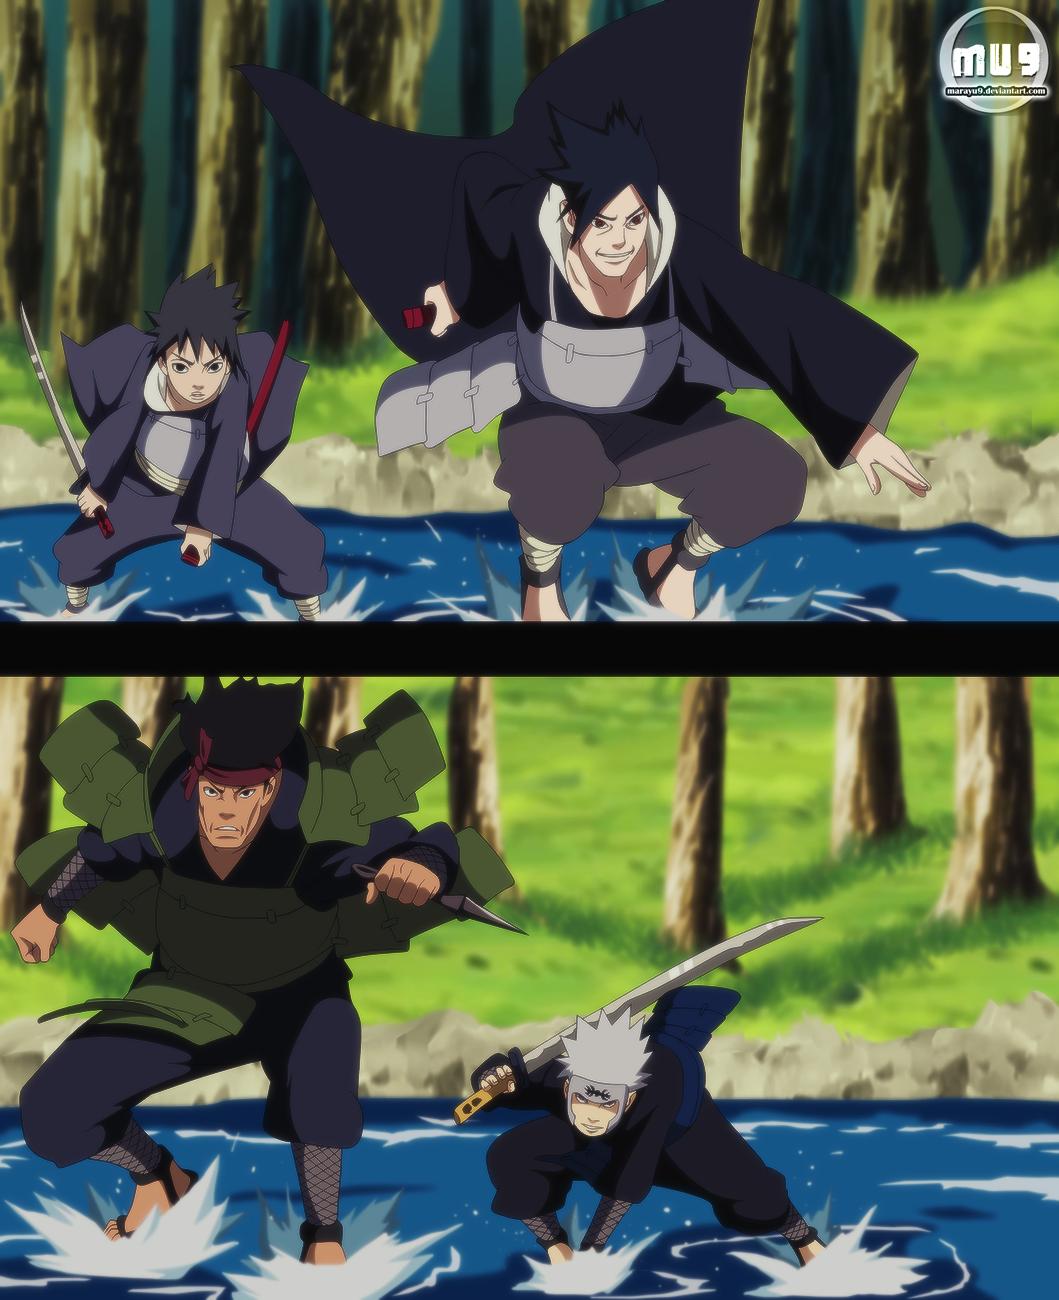 Uchiha vs Senju by MaRaYu9